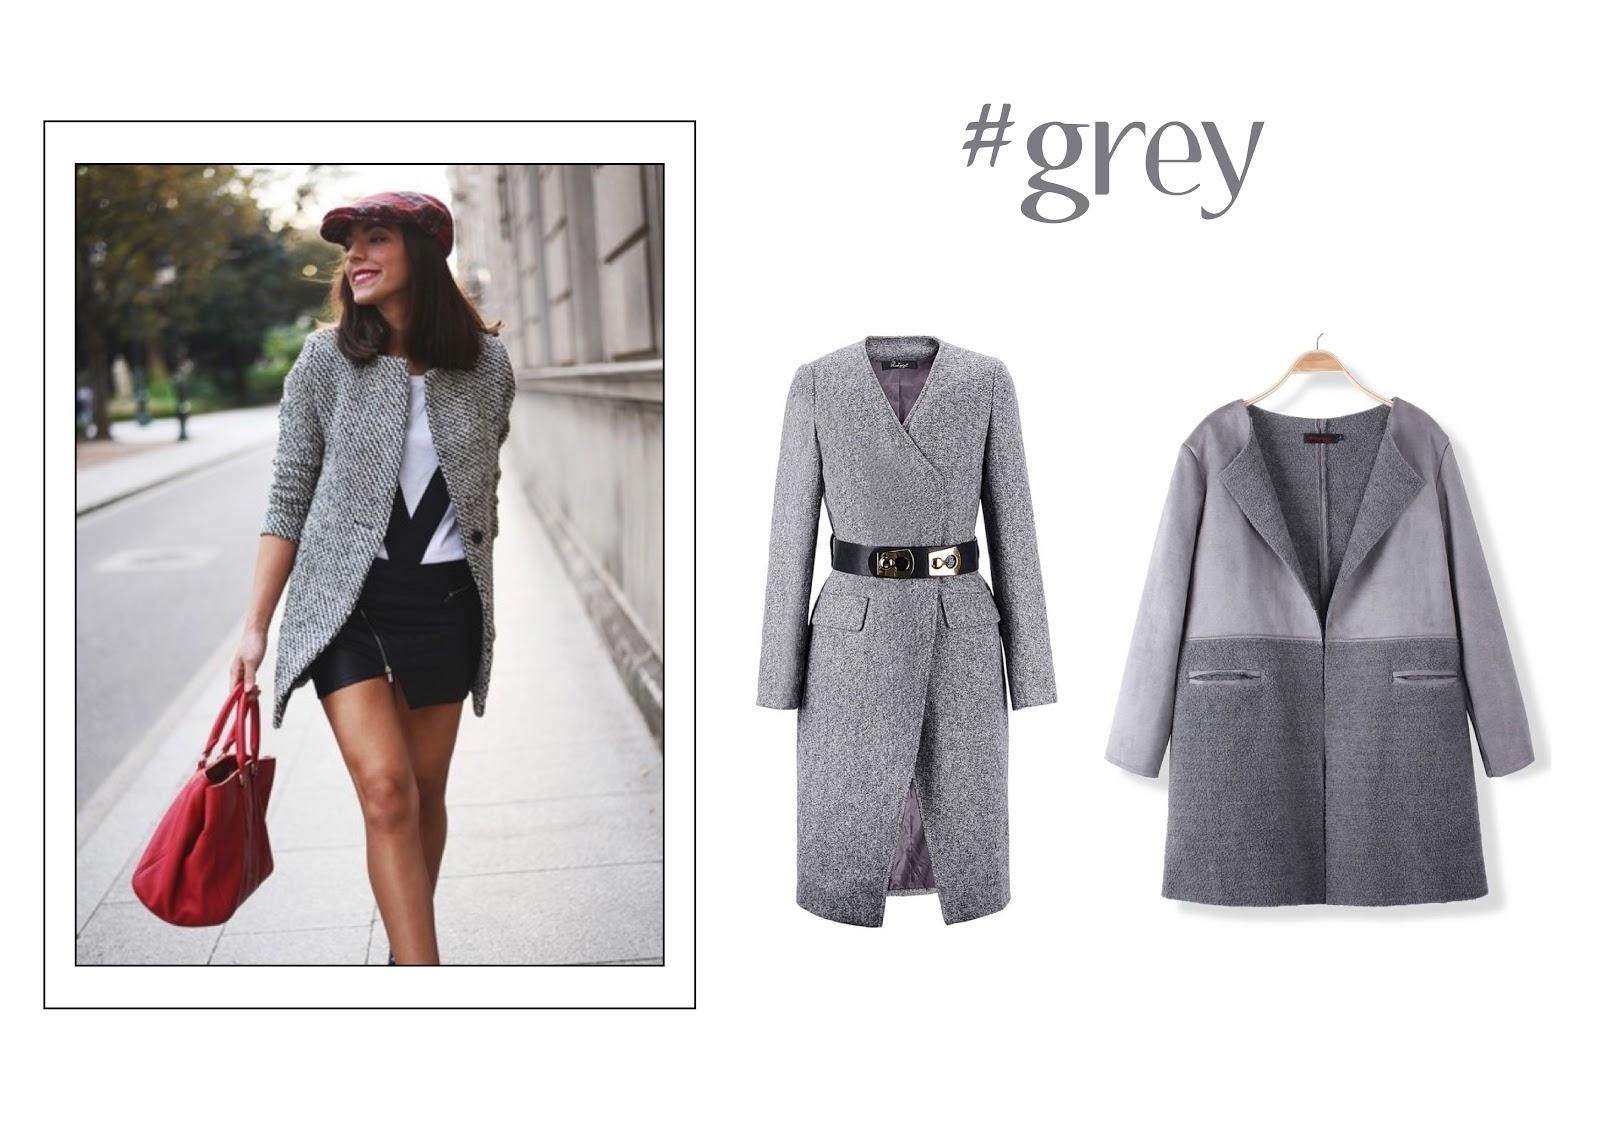 saldi sales shopping guide banged coat cappotti grey pastels camel burgundy  white pastello fur trend glamour 2293991fa03